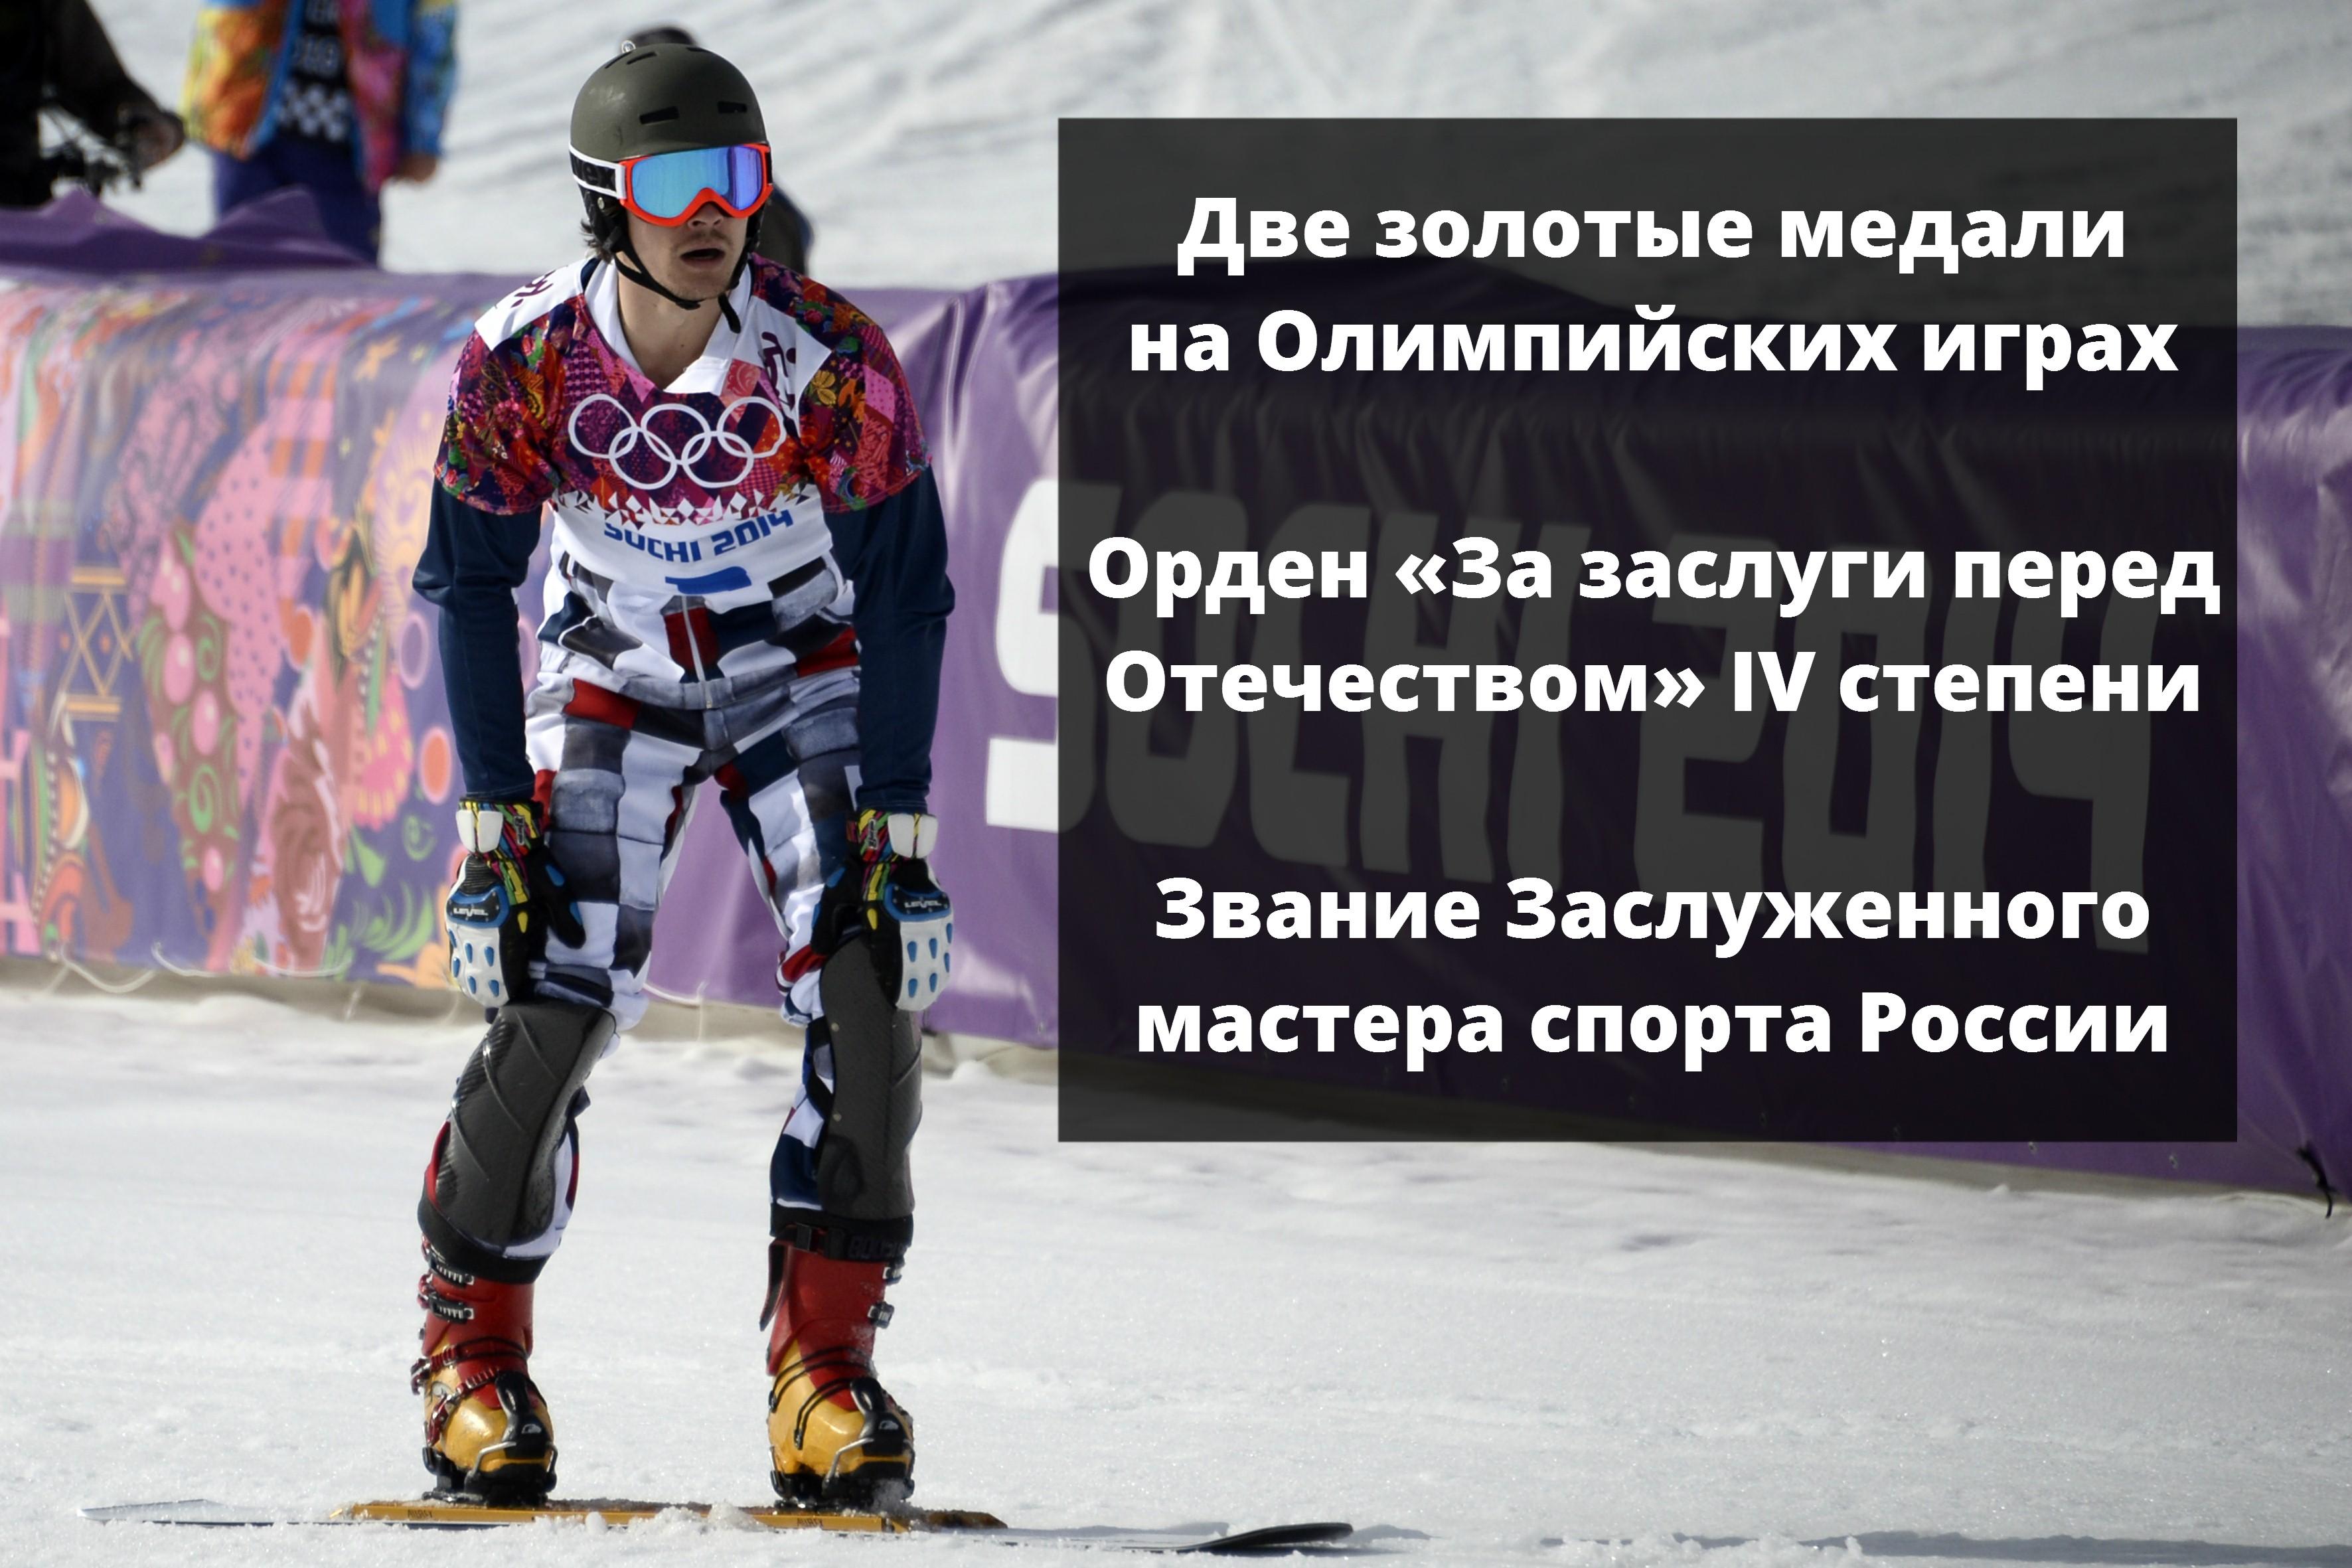 https://i.eurosport.com/2014/12/24/1377564.jpg